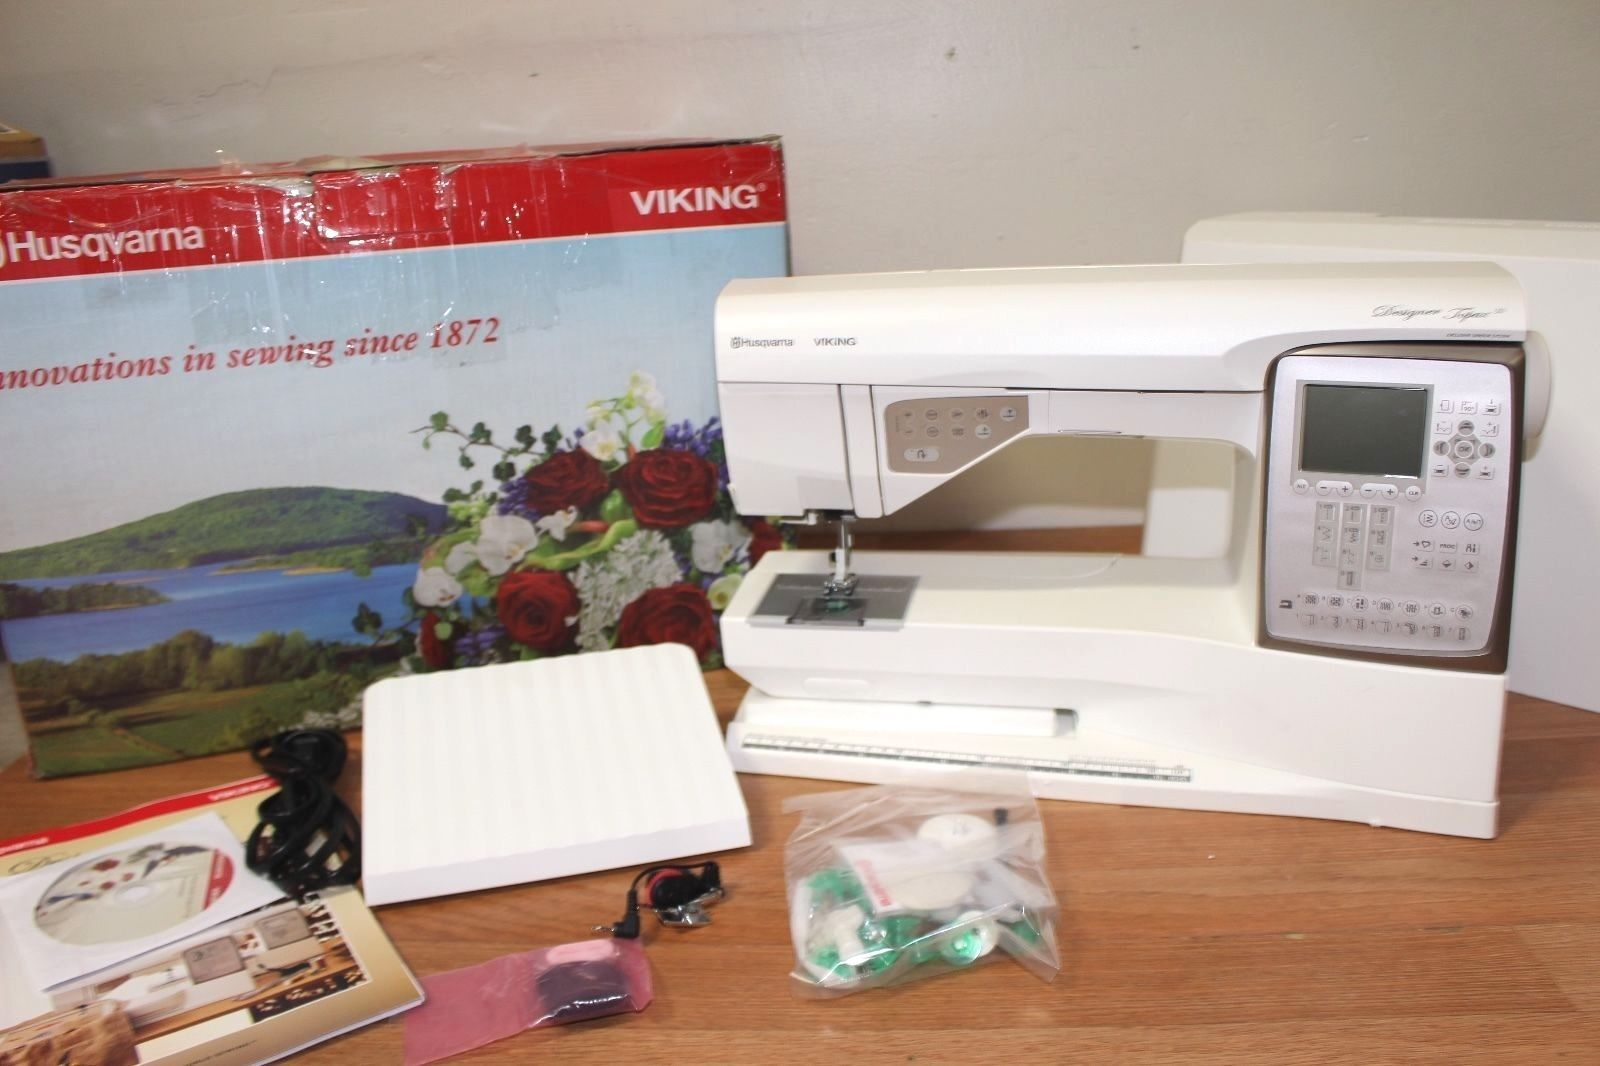 viking topaz 30 embroidery machine